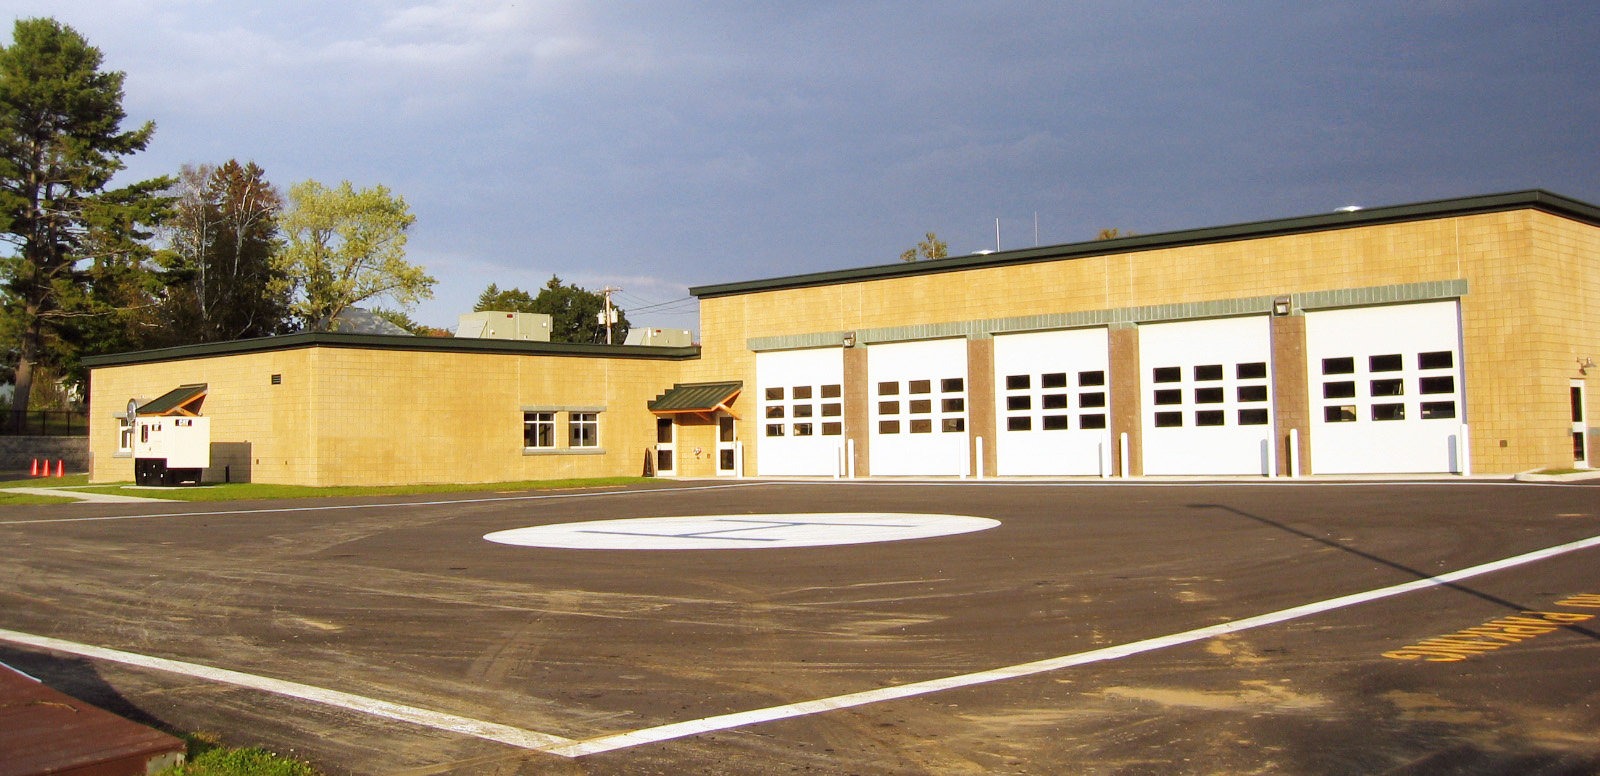 Corinth Volunteer Fire Department